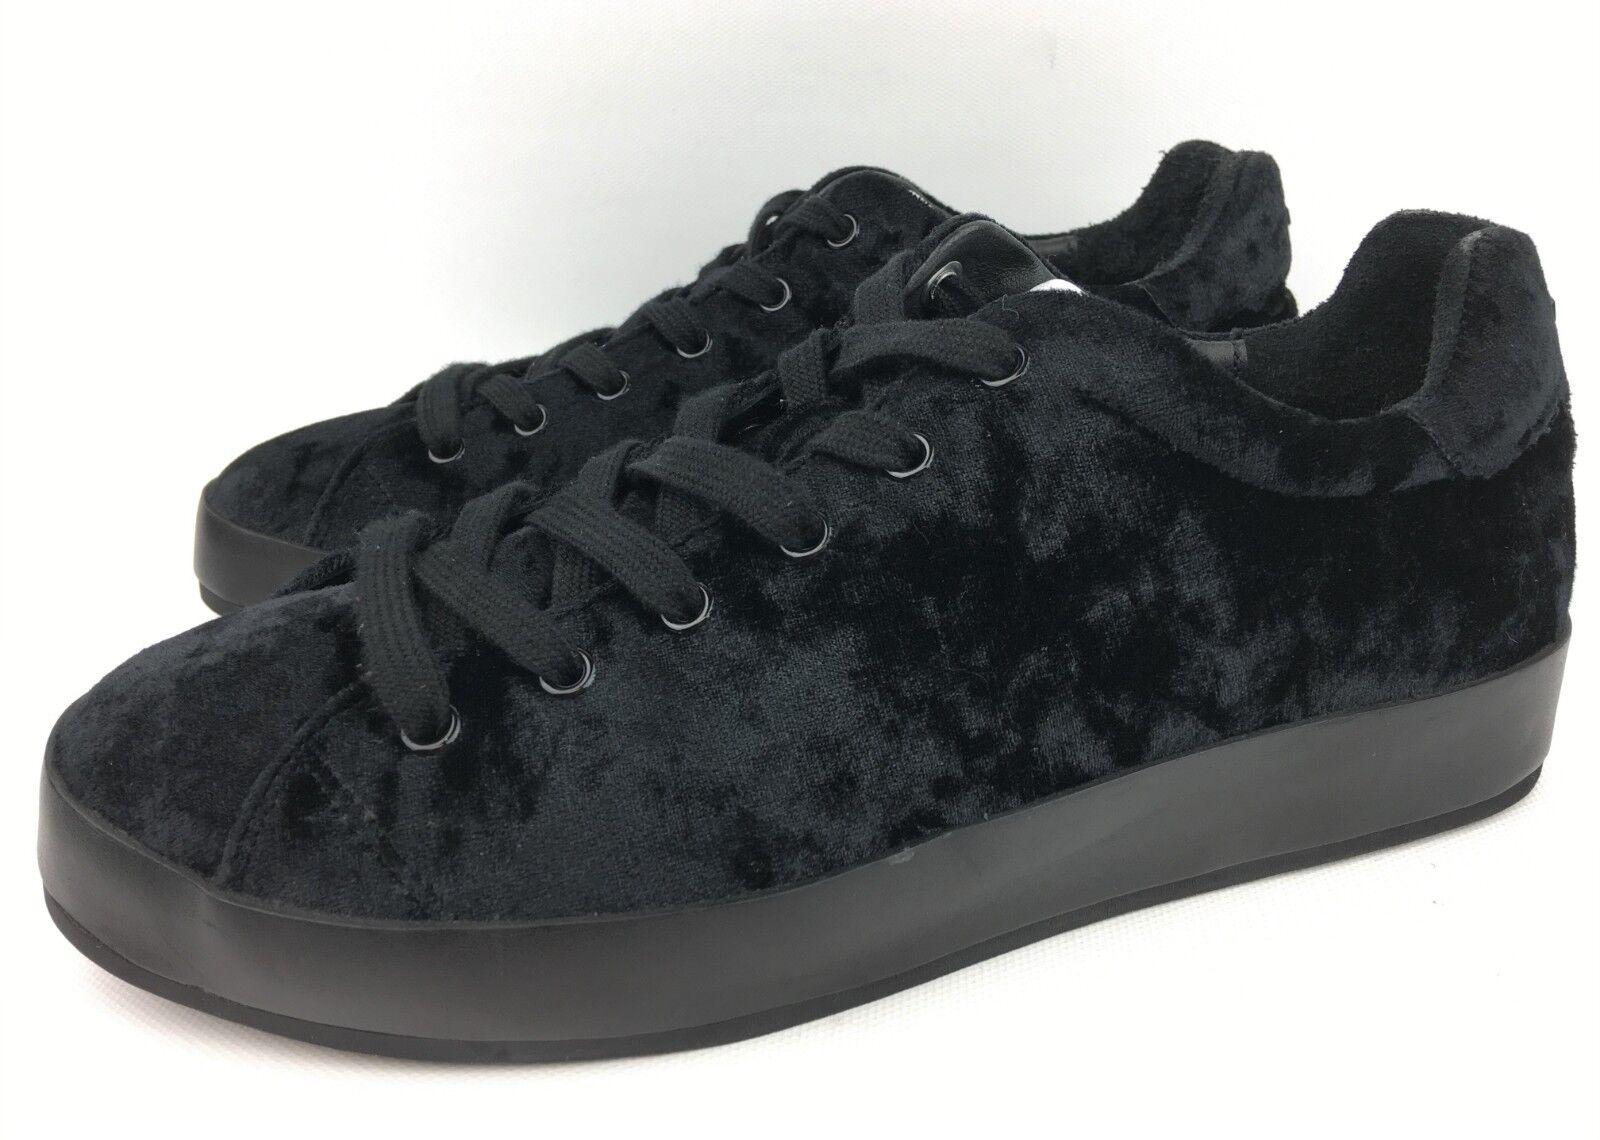 Rag & Bone Women's RB1 Low Velvet Black Sneakers sz  38   US 8 -  325